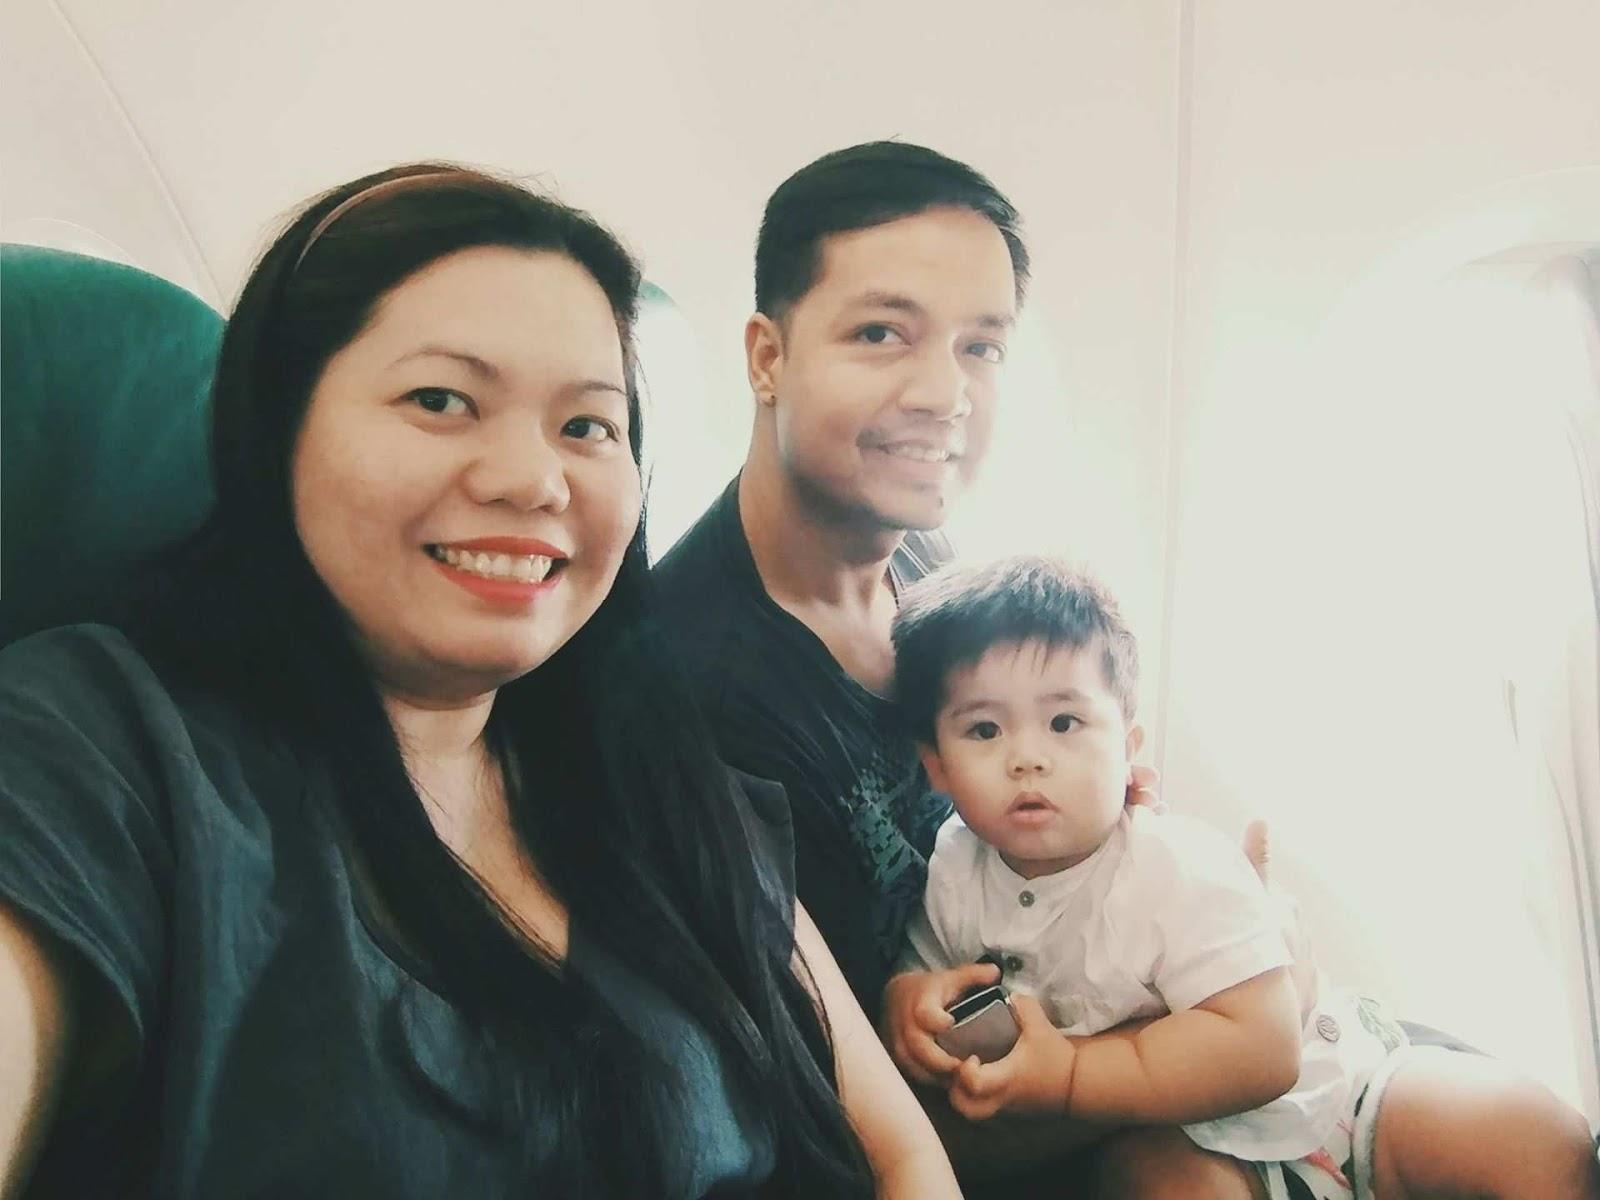 Family traveling post COVID-19 lockdown